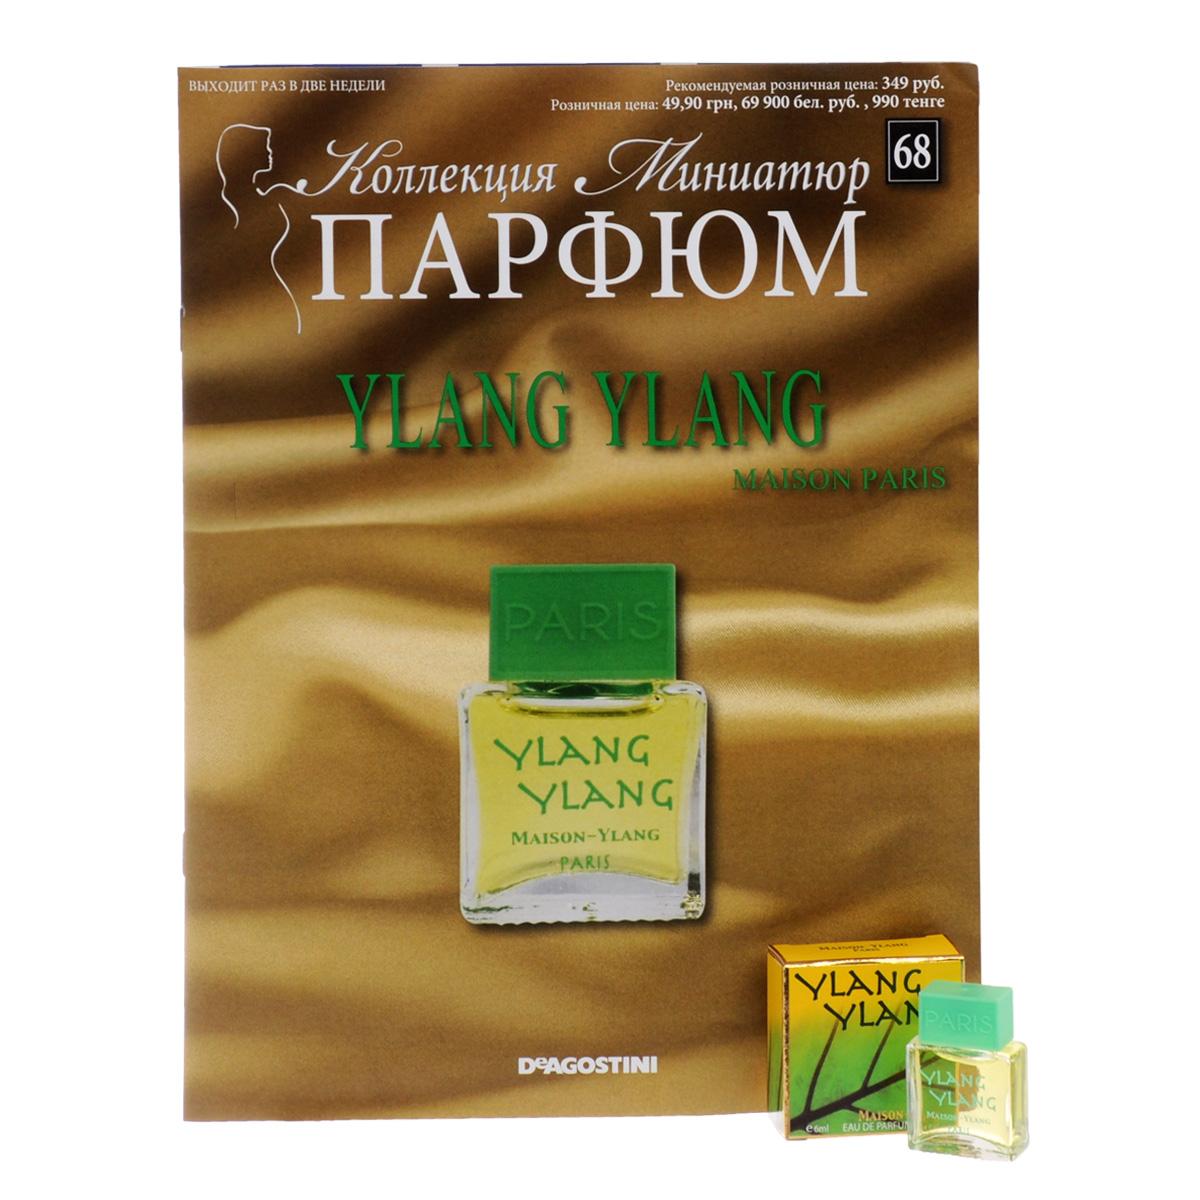 Журнал Парфюм. Коллекция миниатюр №68 кондиционер kapous professional hair conditioning cream with ylang ylang flower essential oil